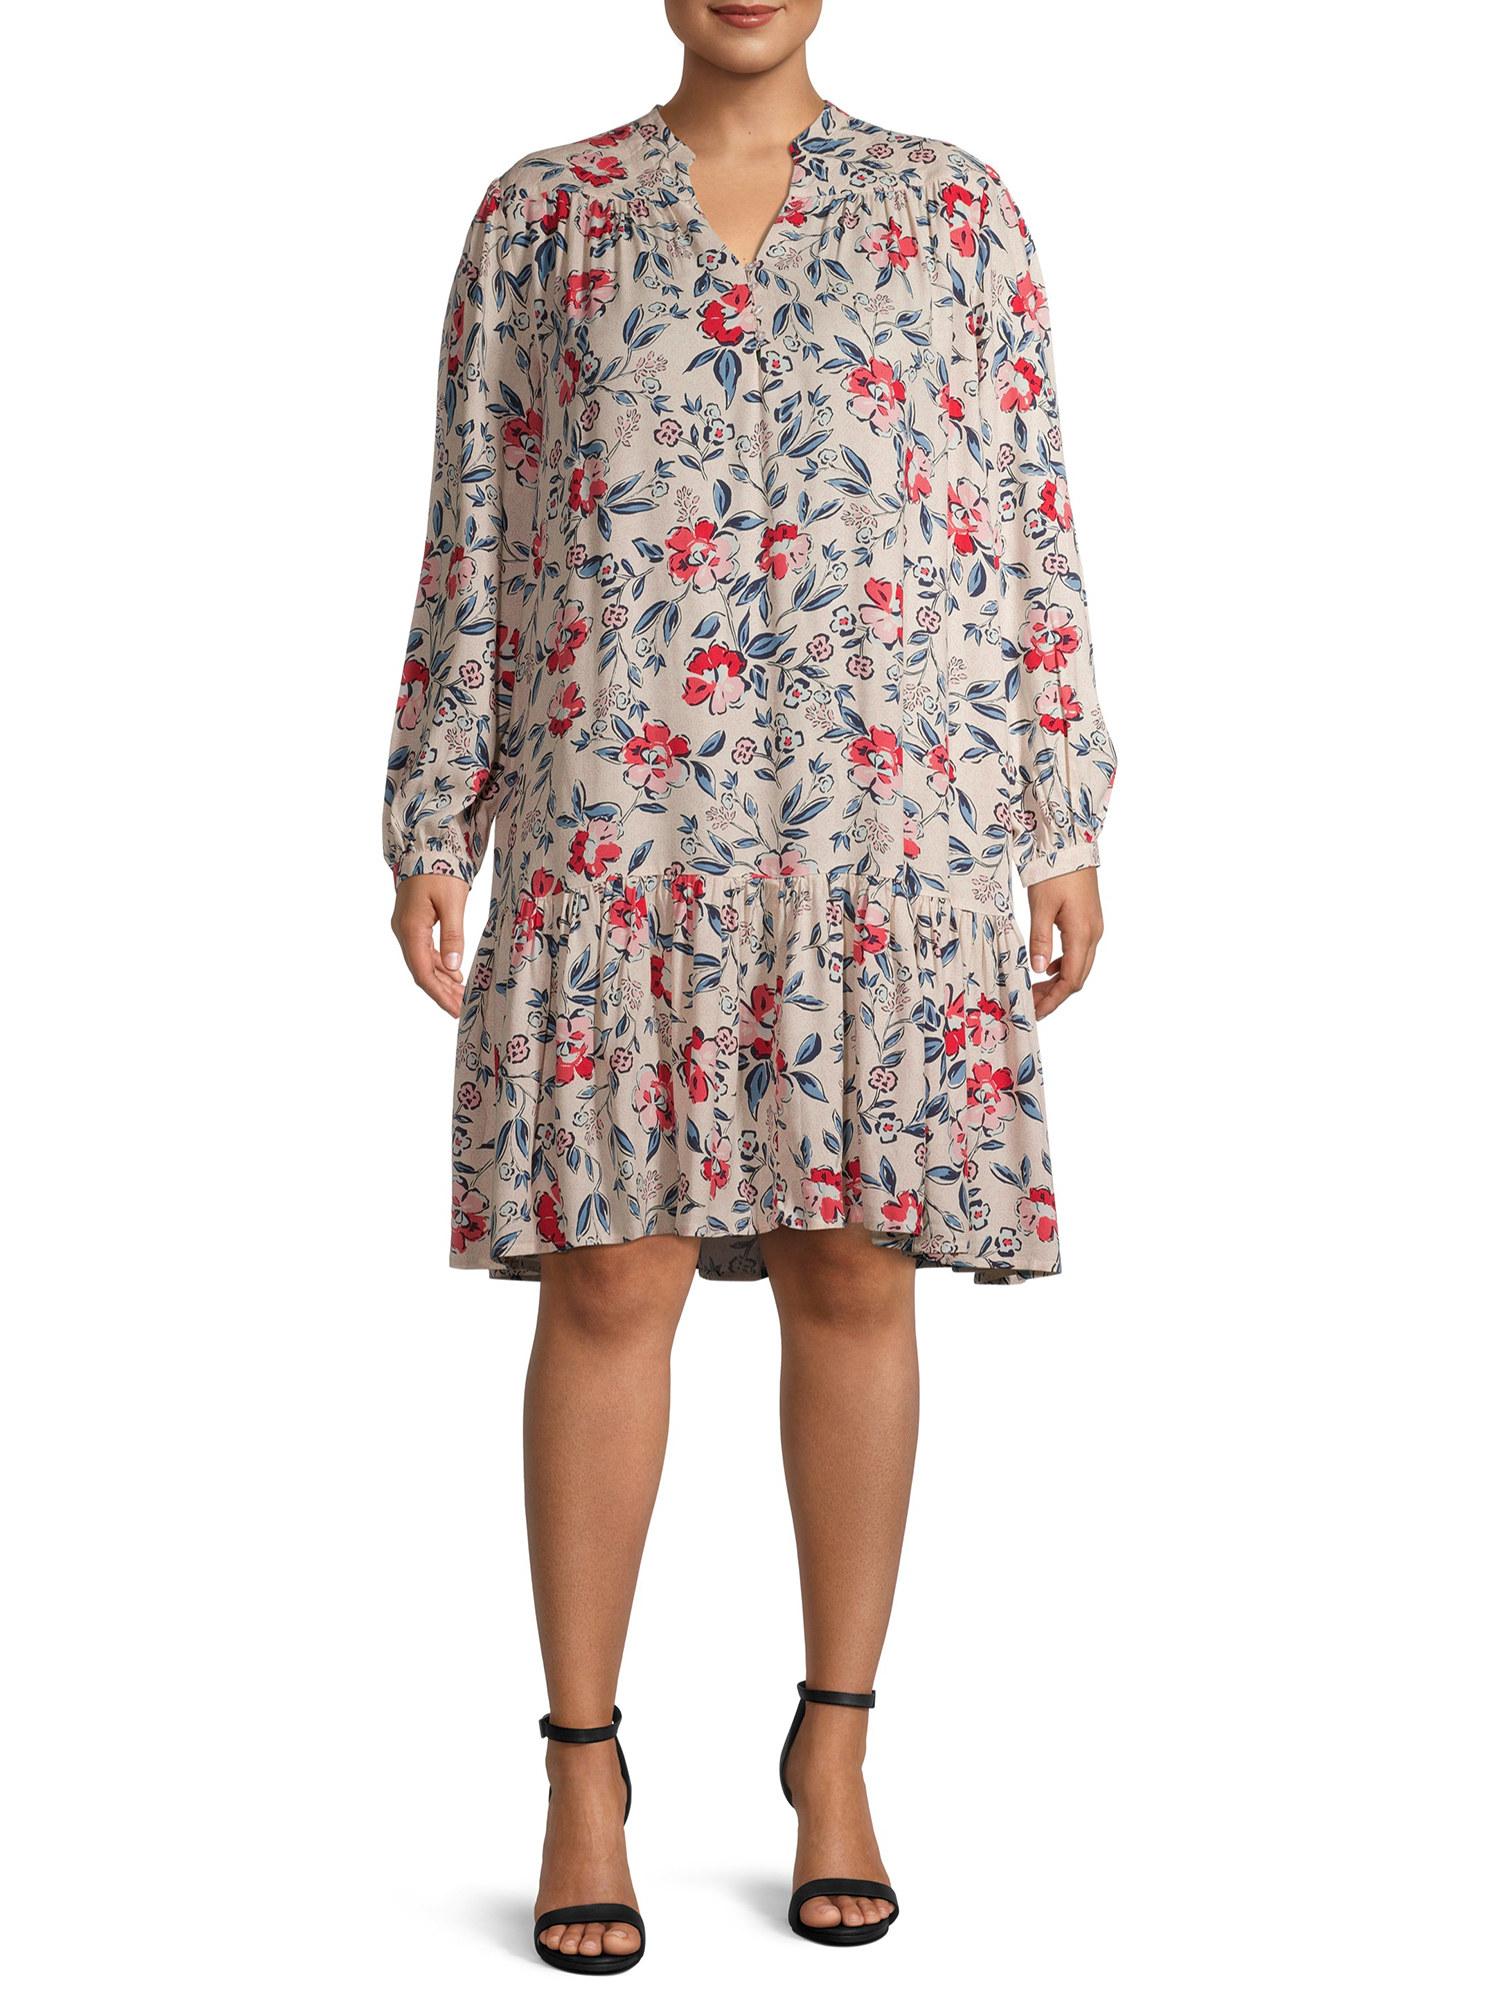 Model in floral printed dress